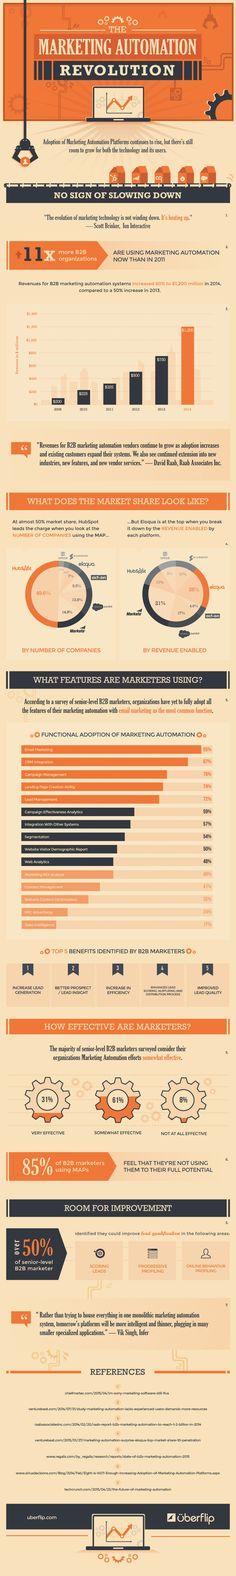 The Marketing Automation Revolution [Infographic] Braveen Kumar Marketing Viral, Inbound Marketing, Marketing Automation, Marketing Technology, Guerilla Marketing, Direct Marketing, The Marketing, Business Marketing, Content Marketing